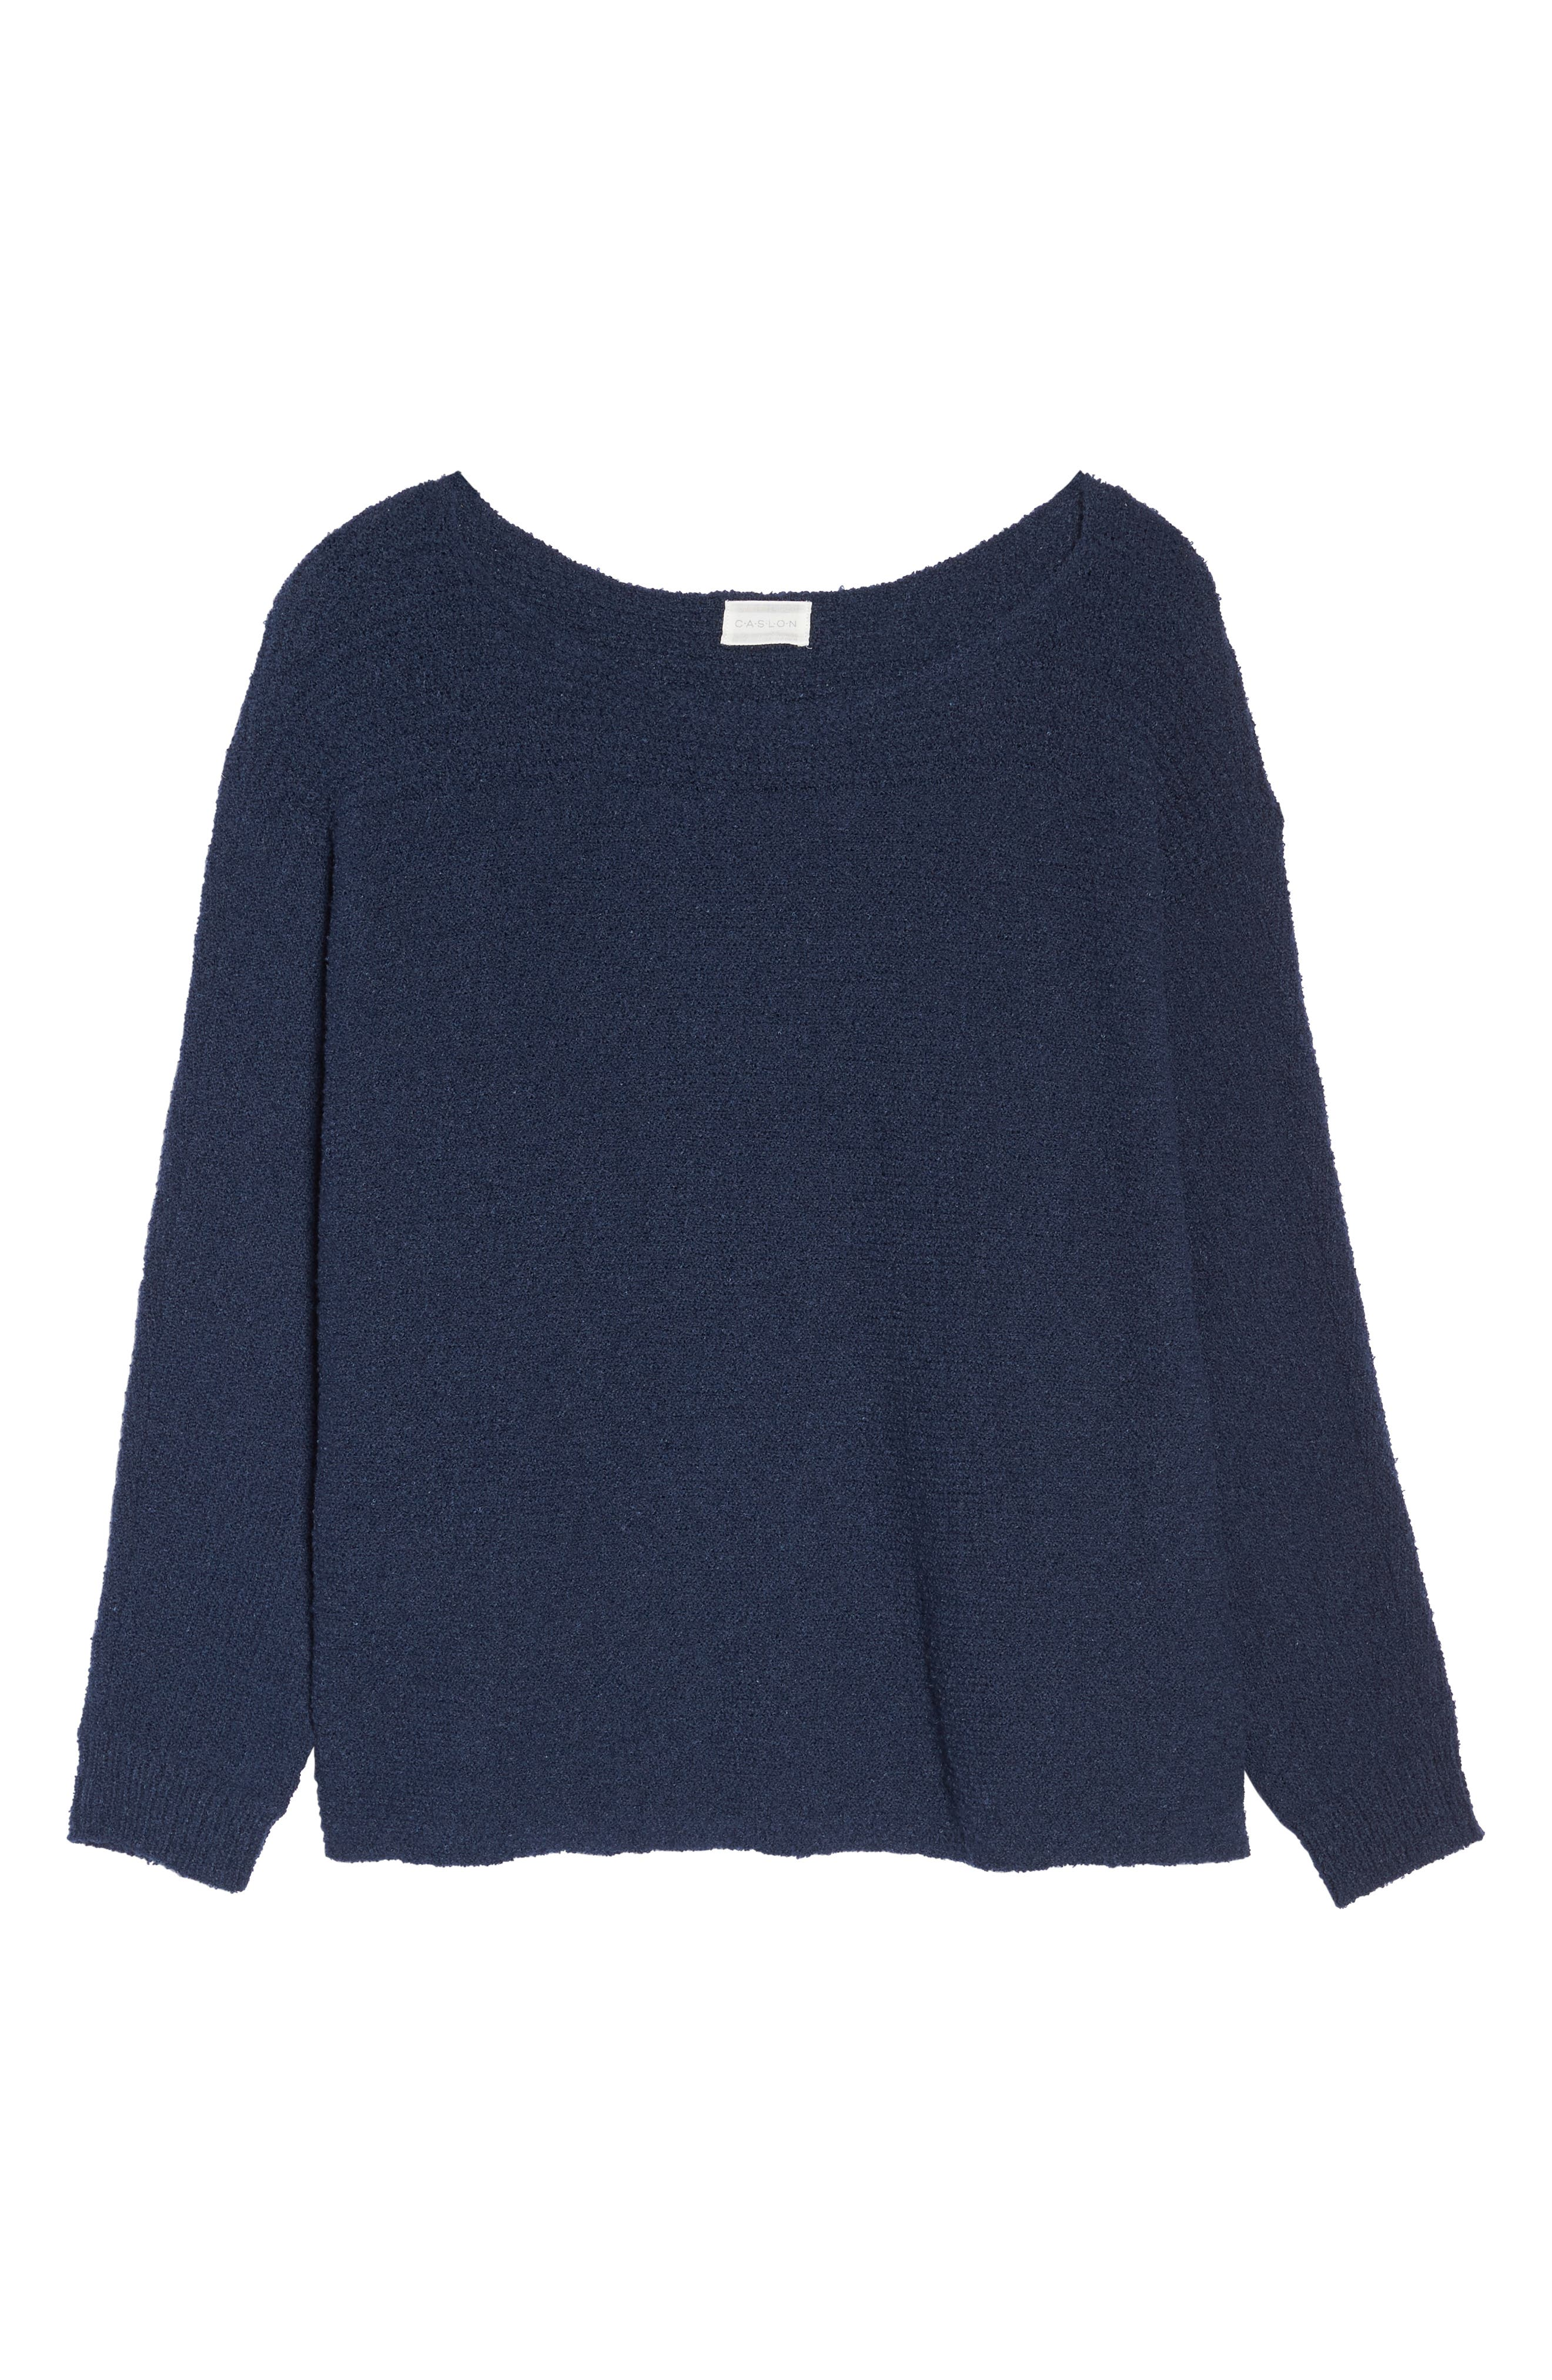 Horizontal Pullover Sweater,                             Alternate thumbnail 7, color,                             410